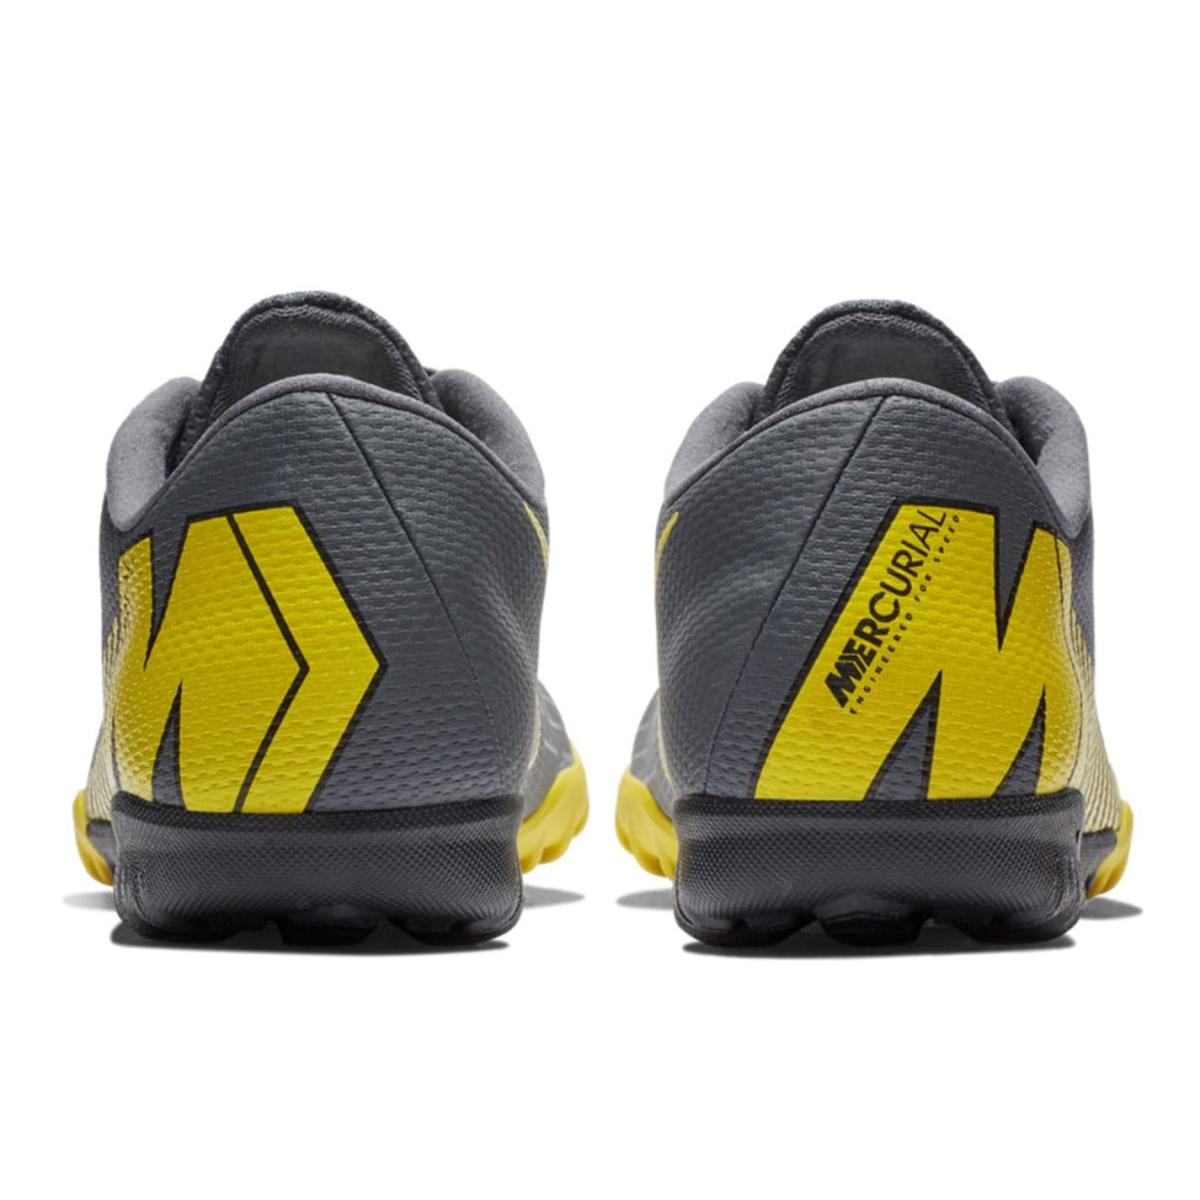 Nike Mercurial Vapor Academy Fußballschuhe Astro Turf AT Herren 1048